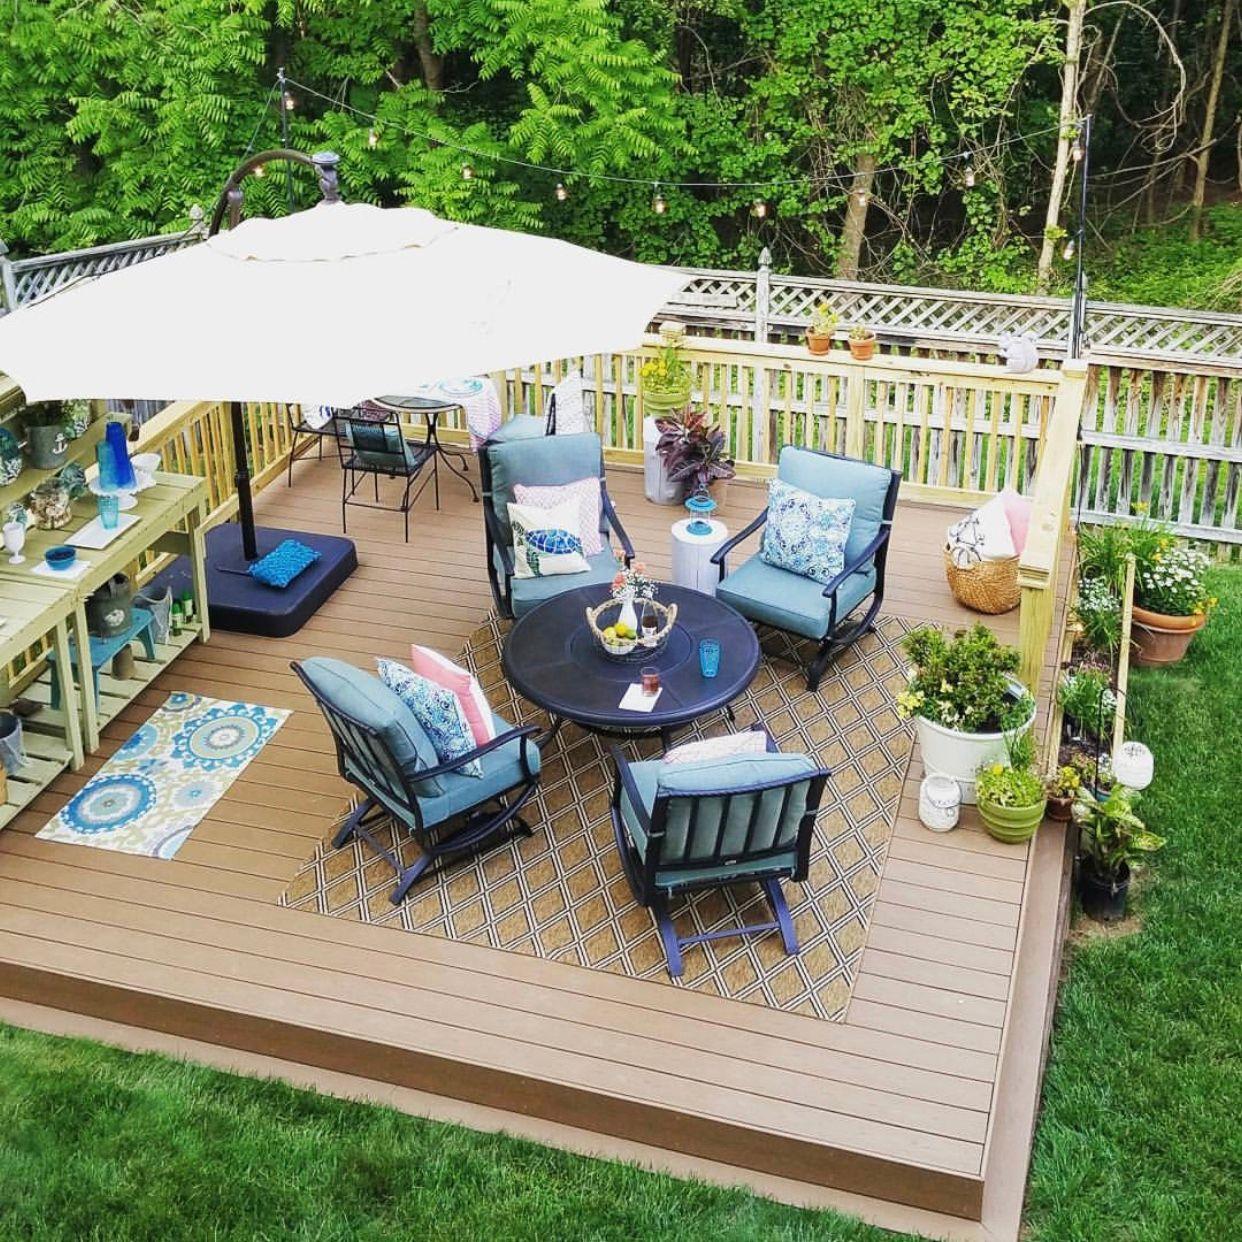 Floating Deck Design Ideas | Floating deck, Diy deck, Deck ... on Floating Patio Ideas id=11950